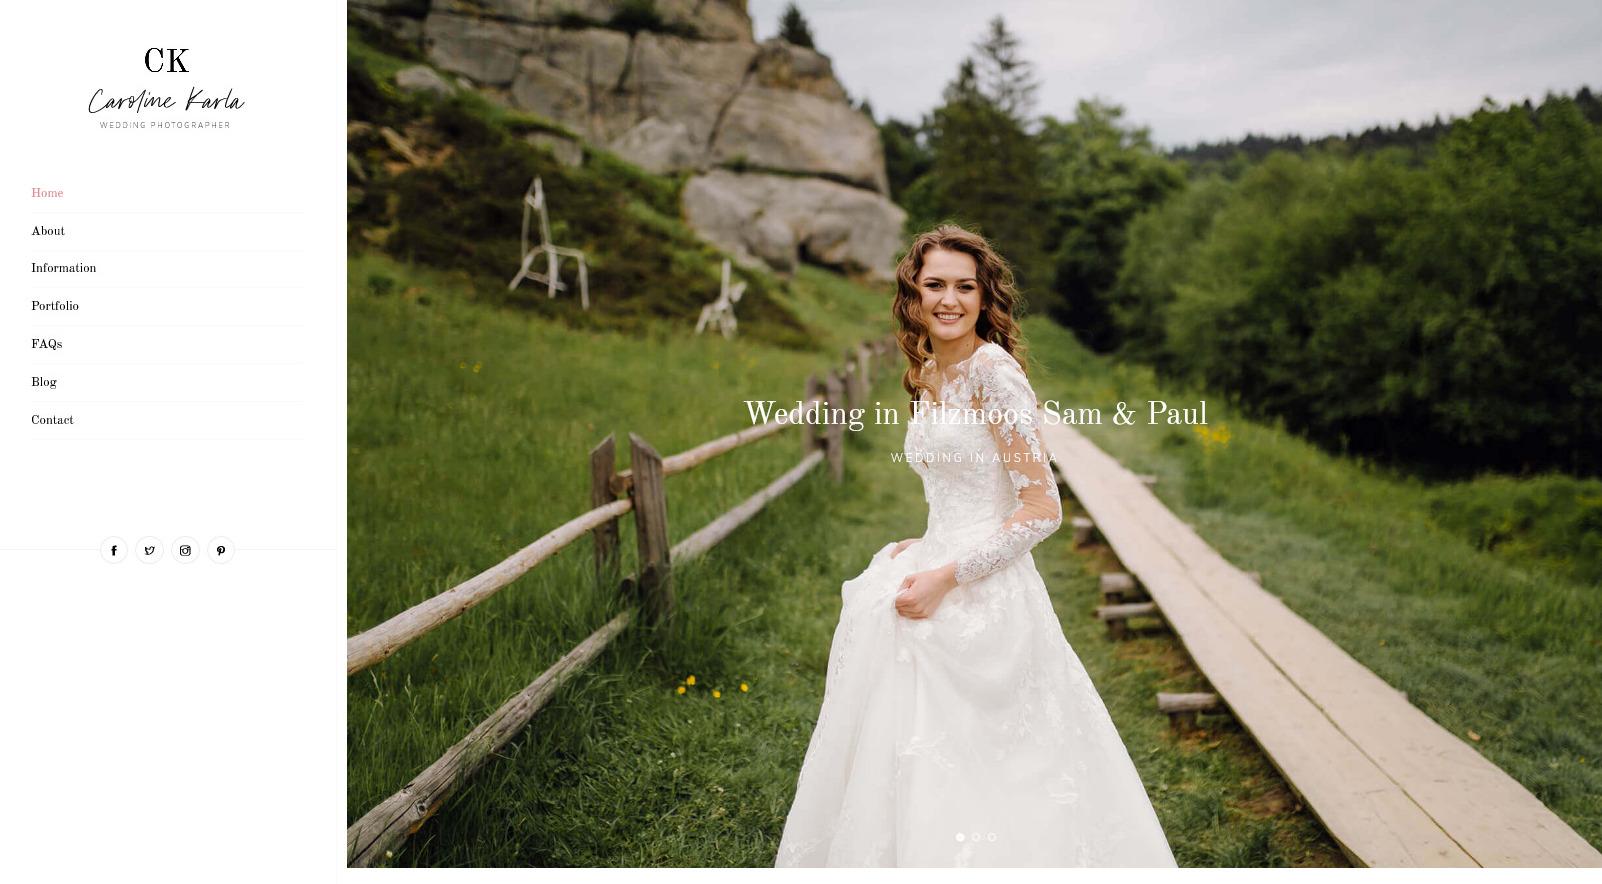 CKarla Wedding and Event Planner WorfdPress Theme